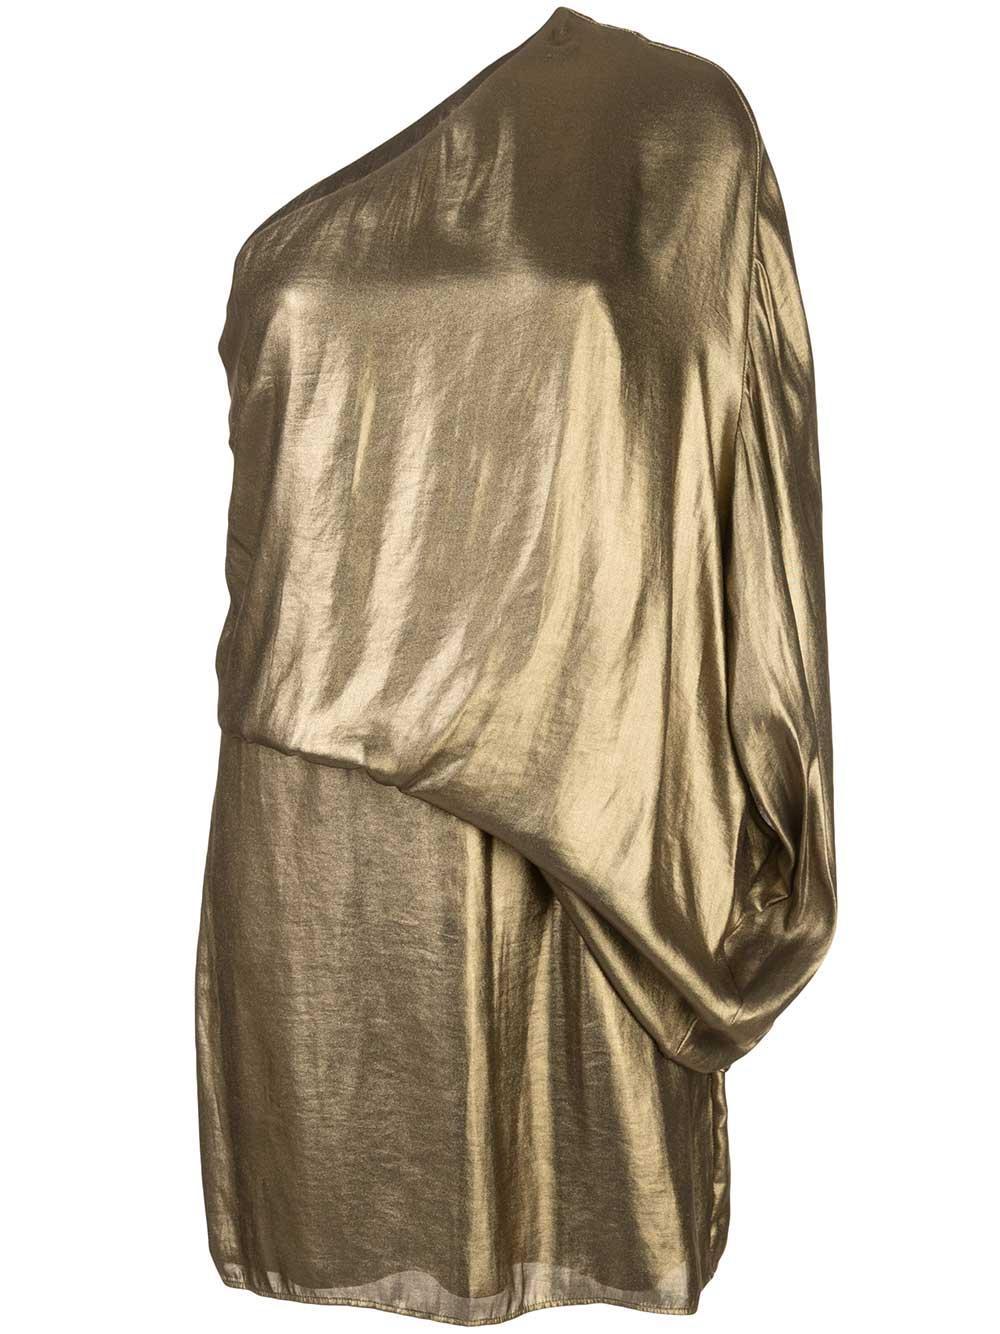 Metallic Drape Dress Item # 1012285